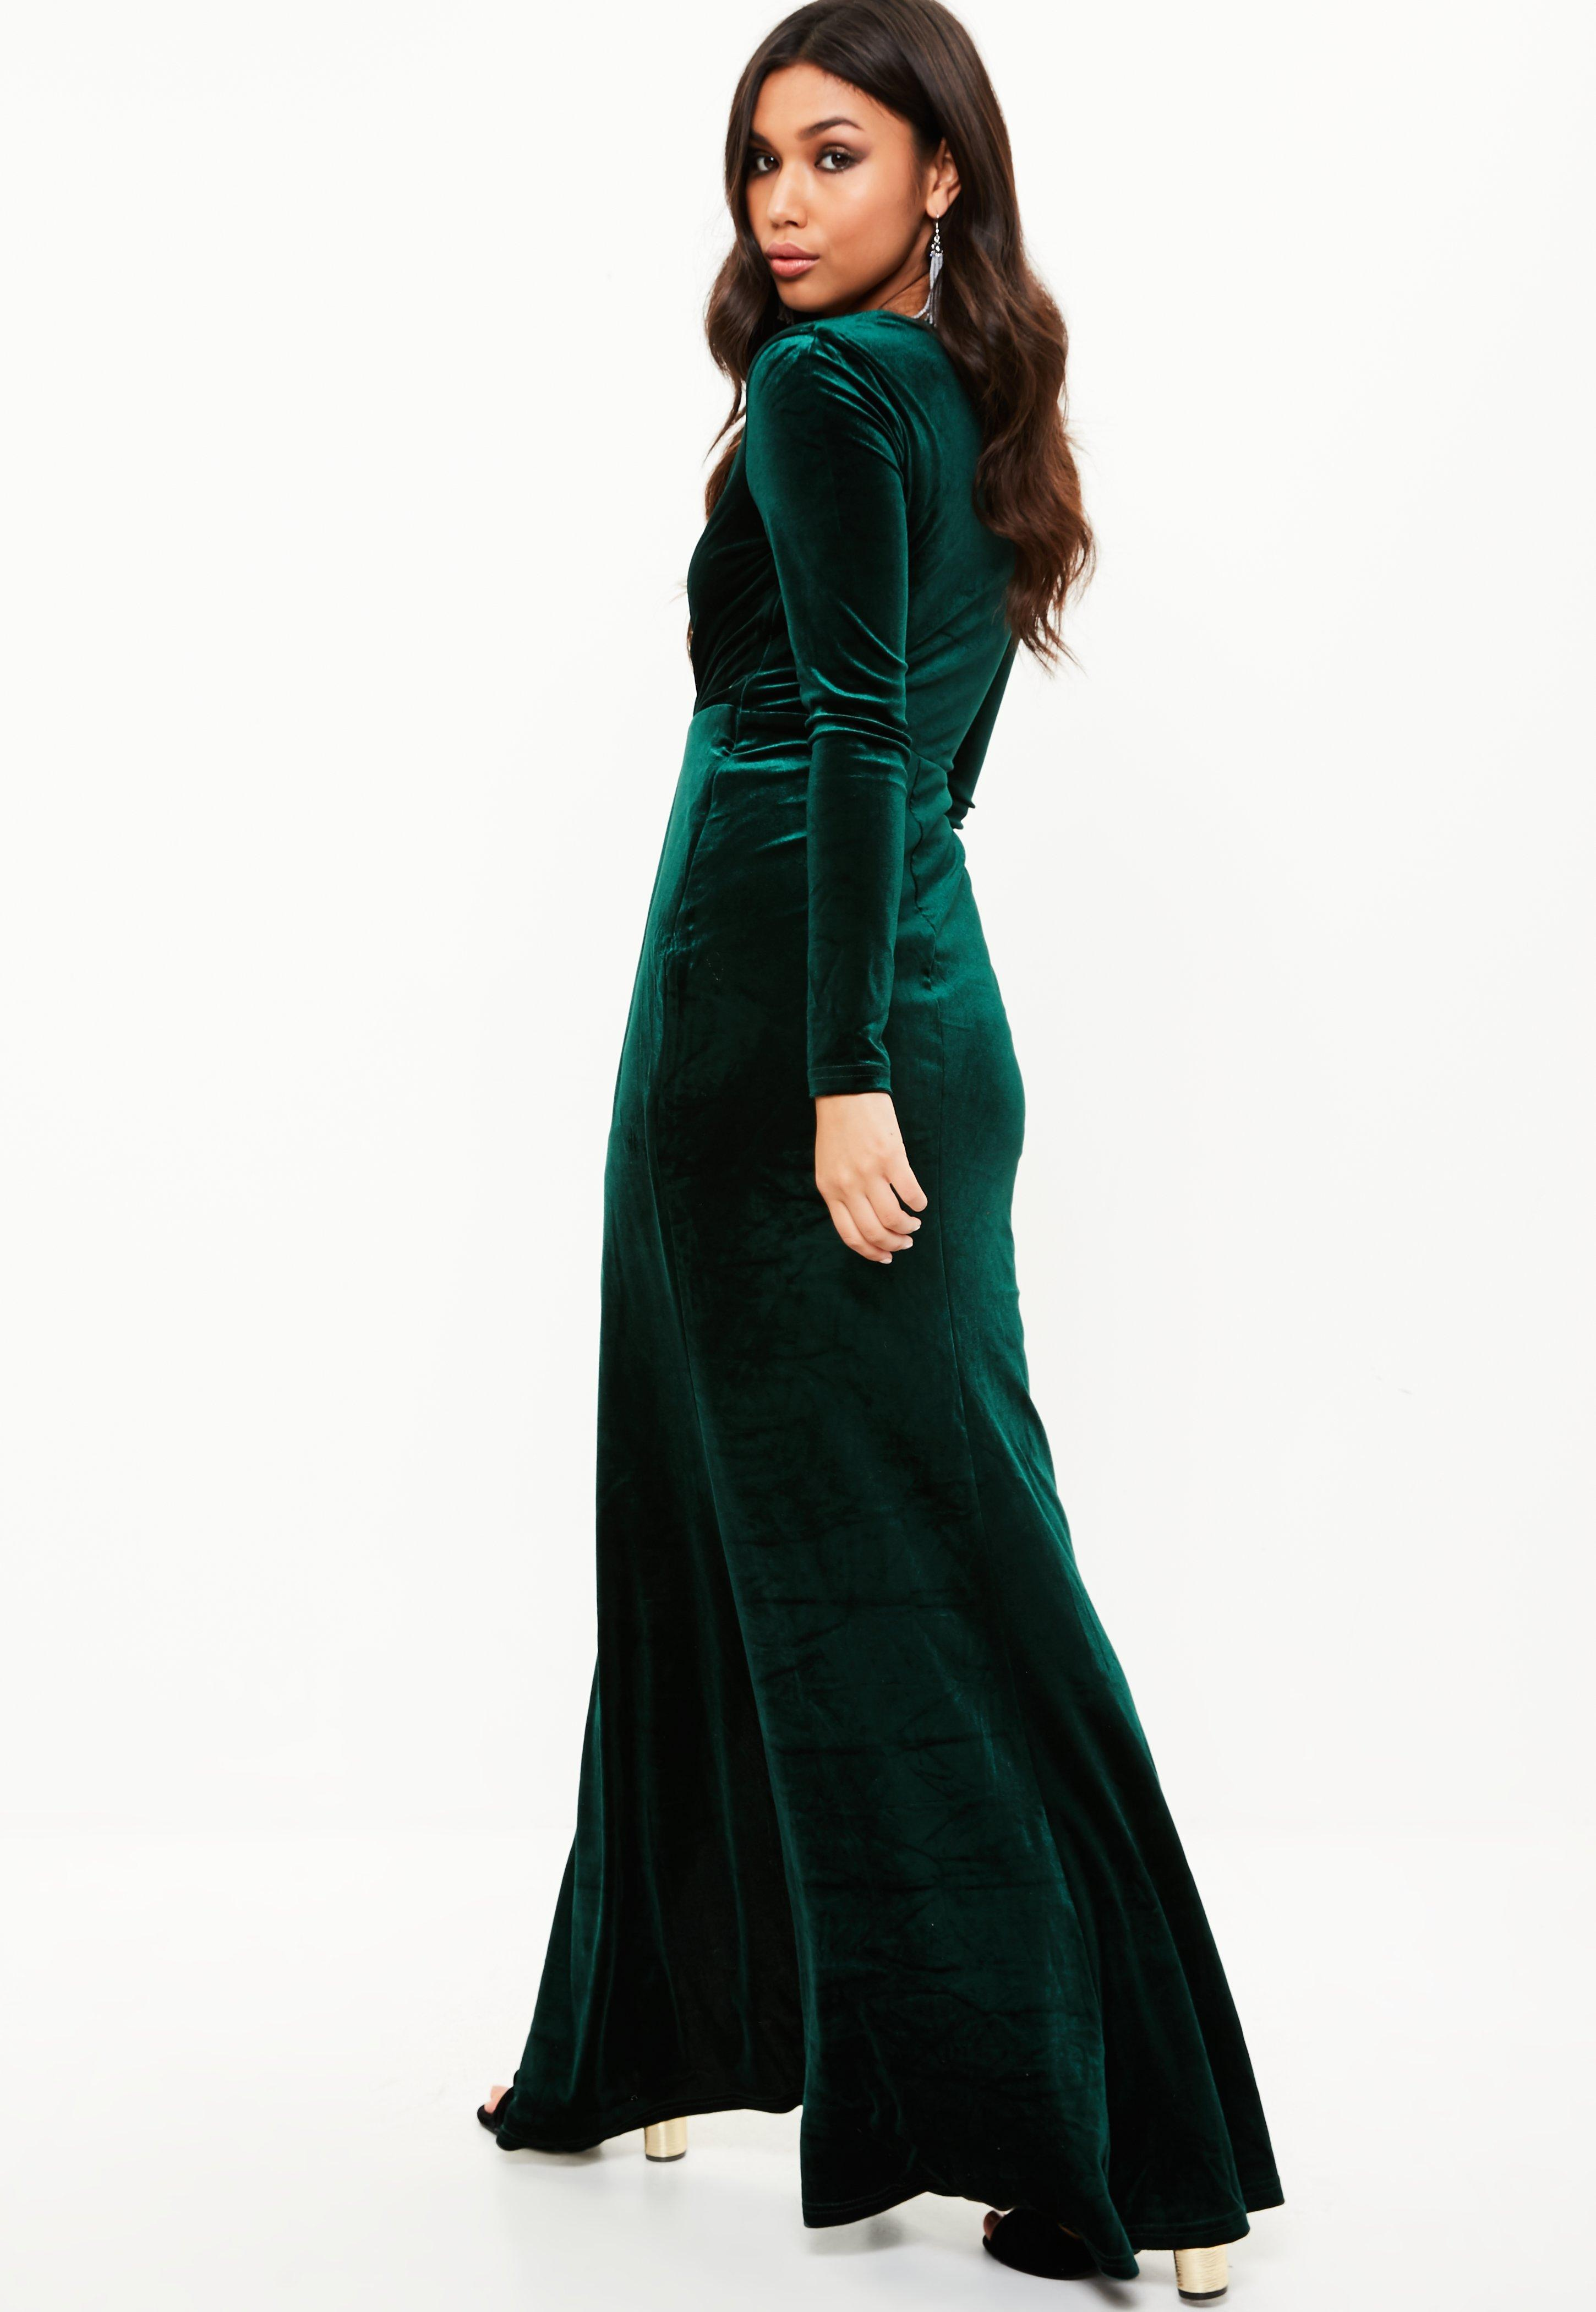 Lyst - Missguided Green Velvet Plunge Long Sleeve Maxi Dress in Green